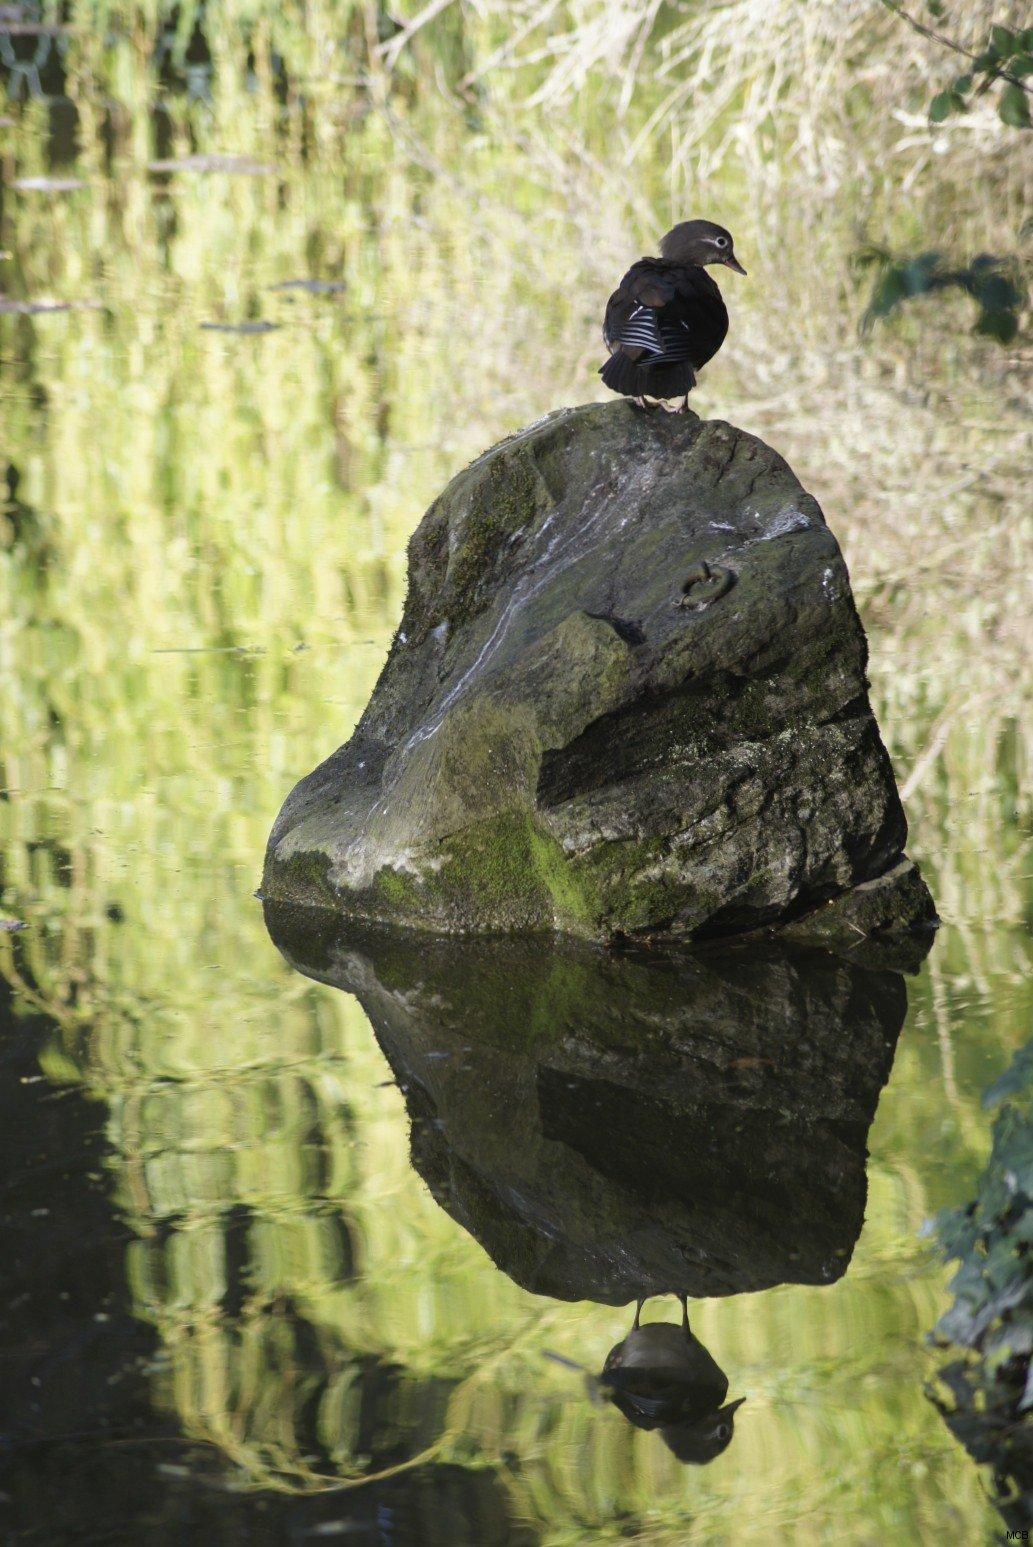 Reflet de canard dans reflets de saule